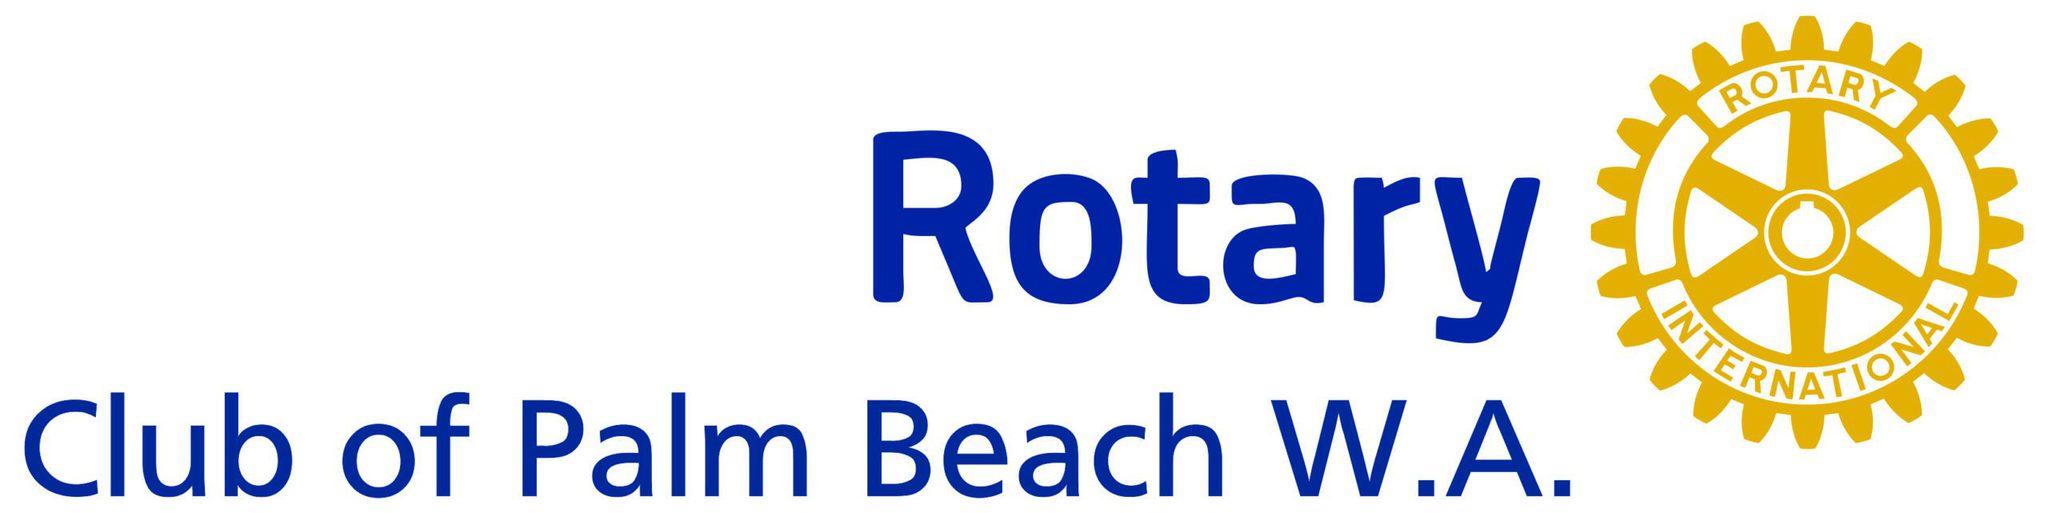 https://rockinghambeachcup.com.au/wp-content/uploads/2021/10/Rotary-Club-of-Palm-Beach-New-Logo-scaled.jpg